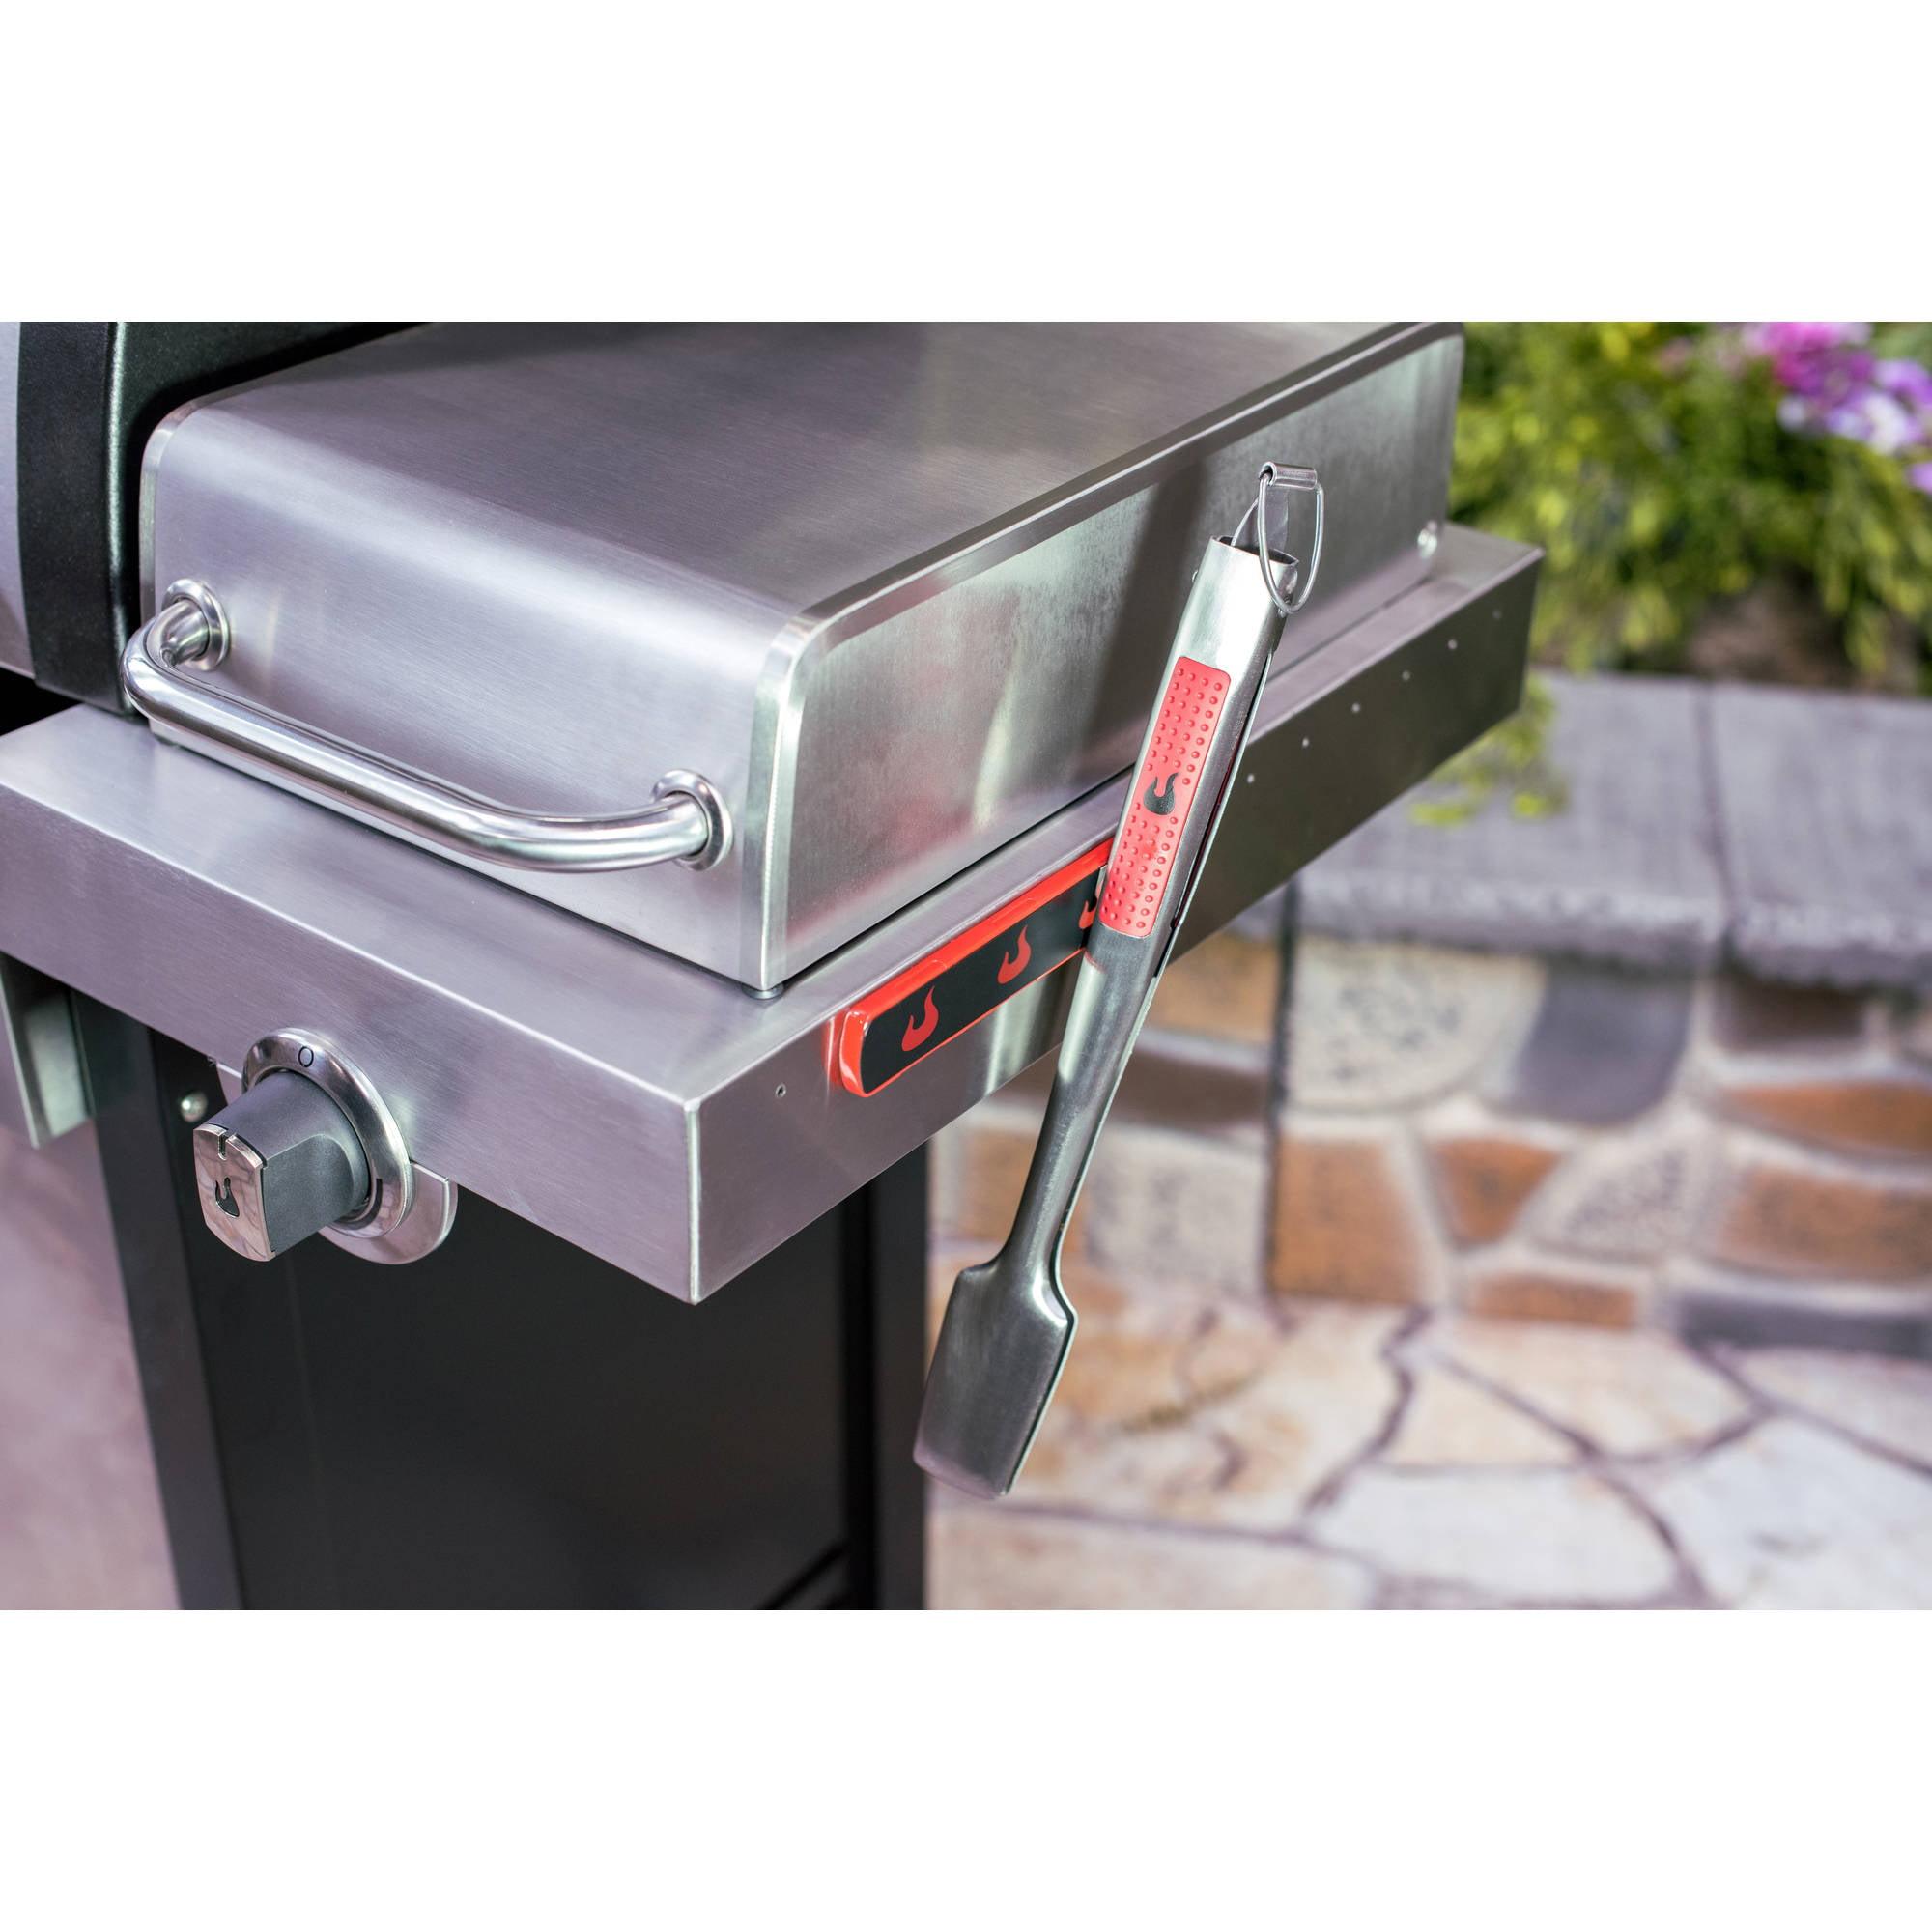 Char Broil Gear Trax Magnet